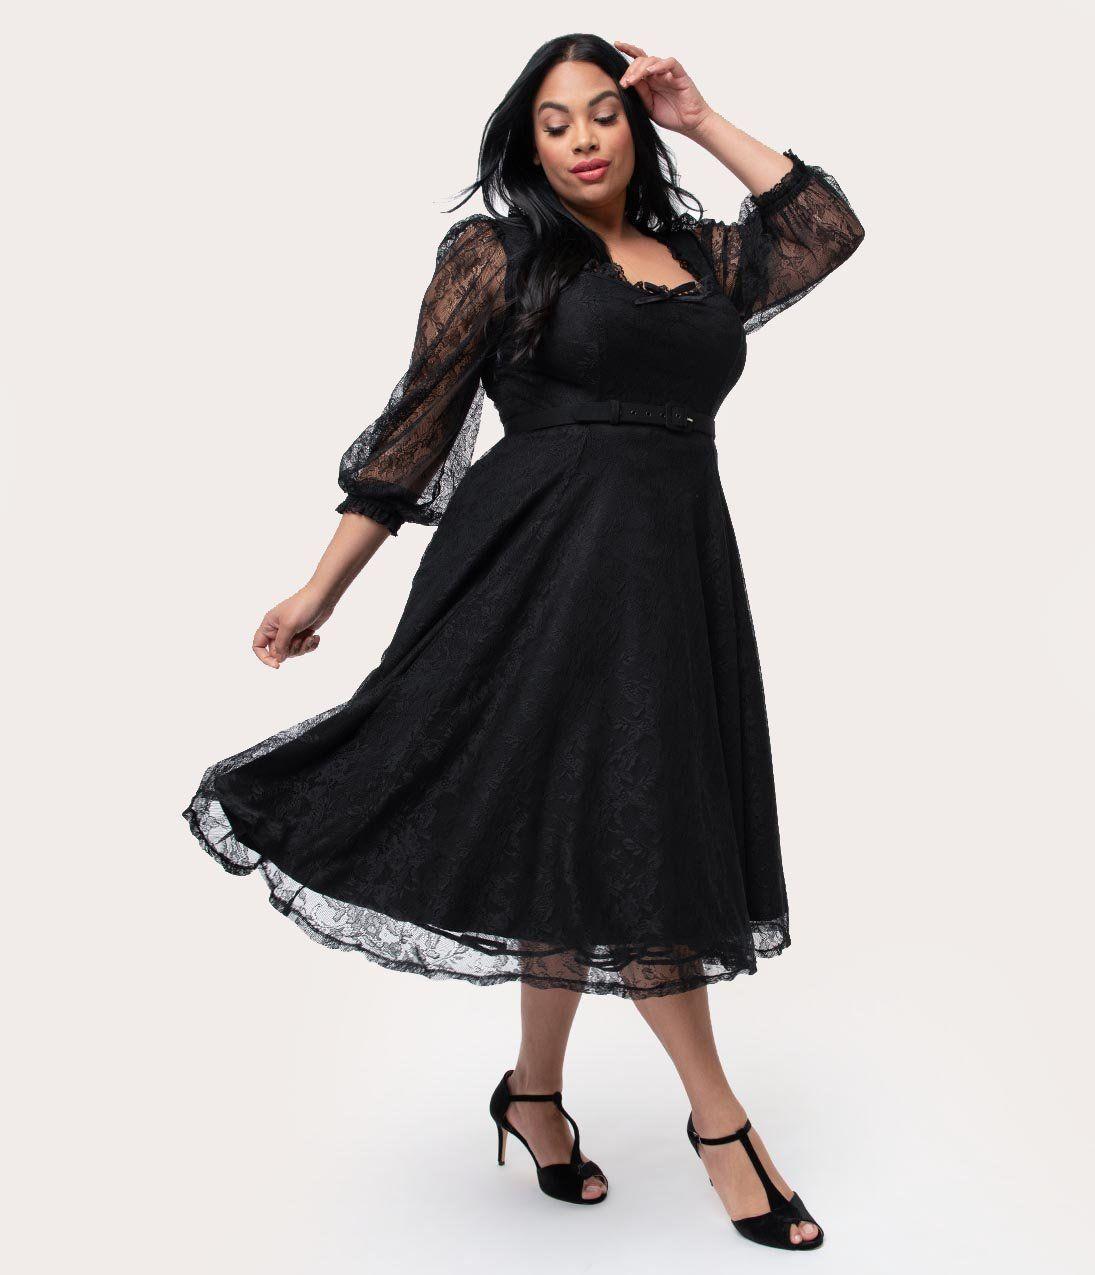 Vintage Inspired Evening Dresses Gowns And Formal Wear Lace Dress Vintage Evening Dresses Vintage Cocktail Dress Vintage